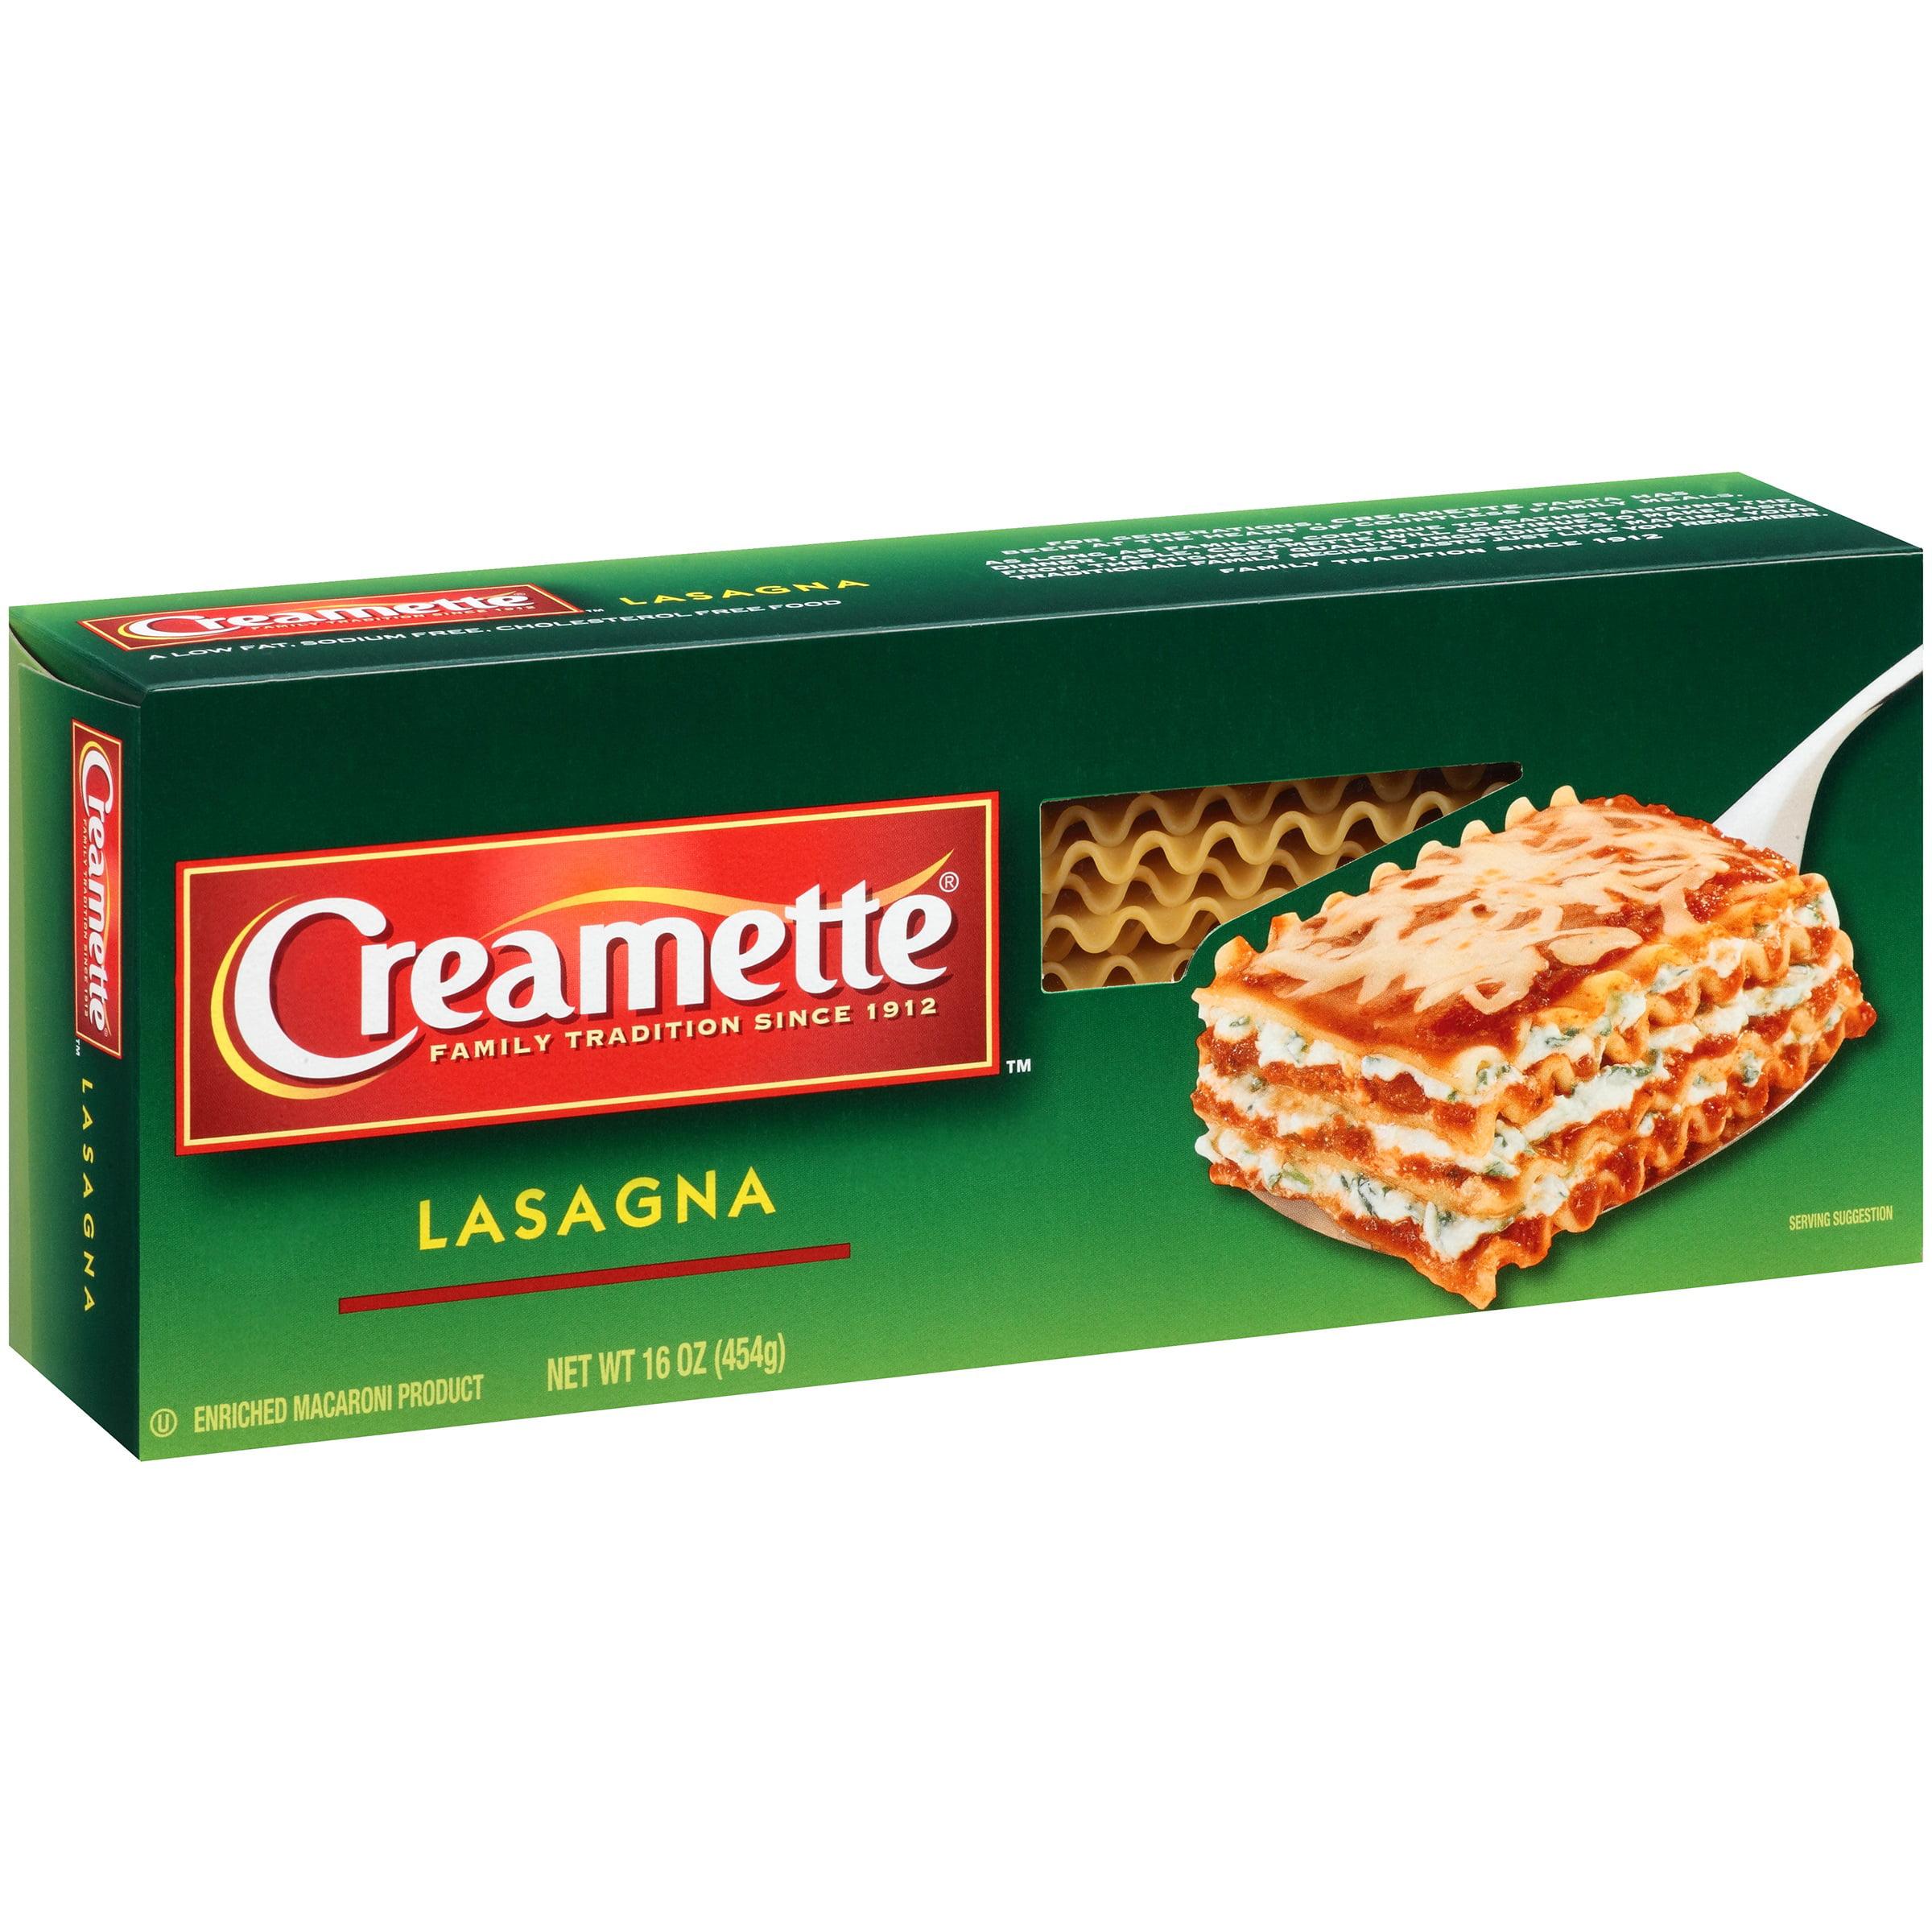 Creamette Lasagna, 16 oz by New World Pasta